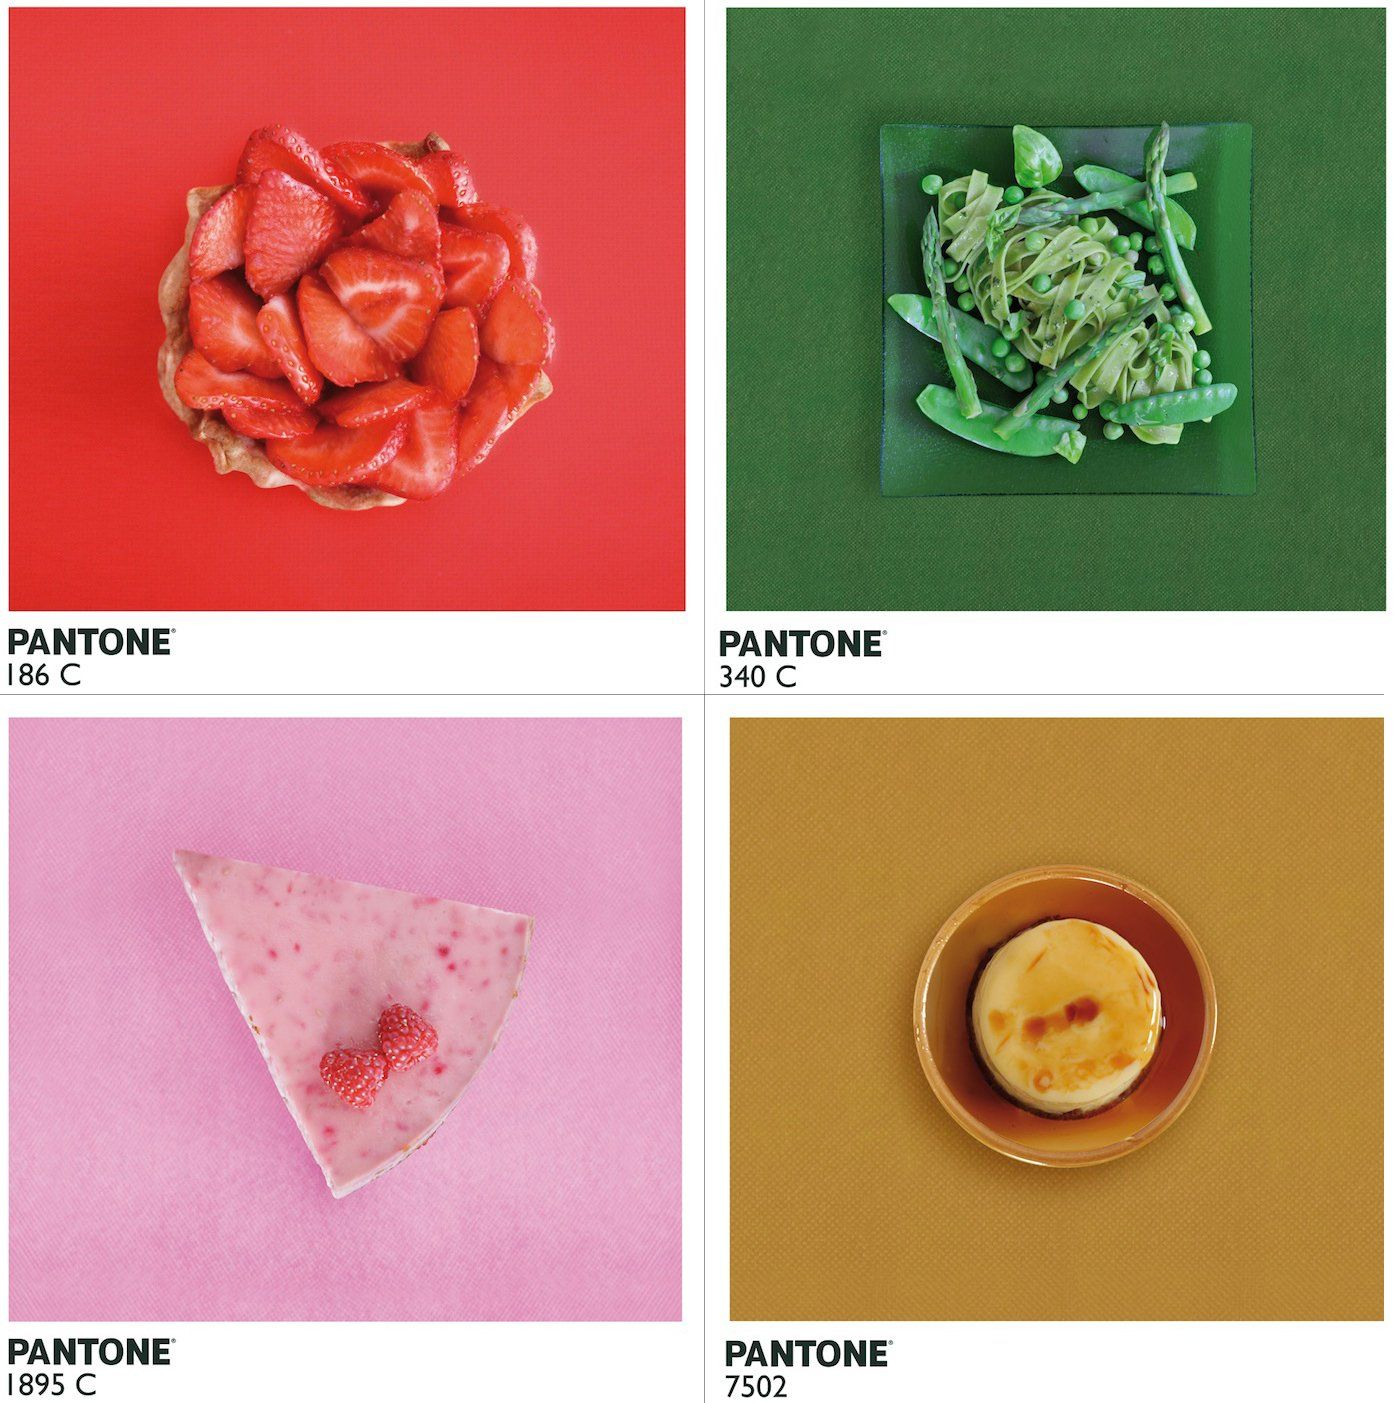 food pantone - Google Search